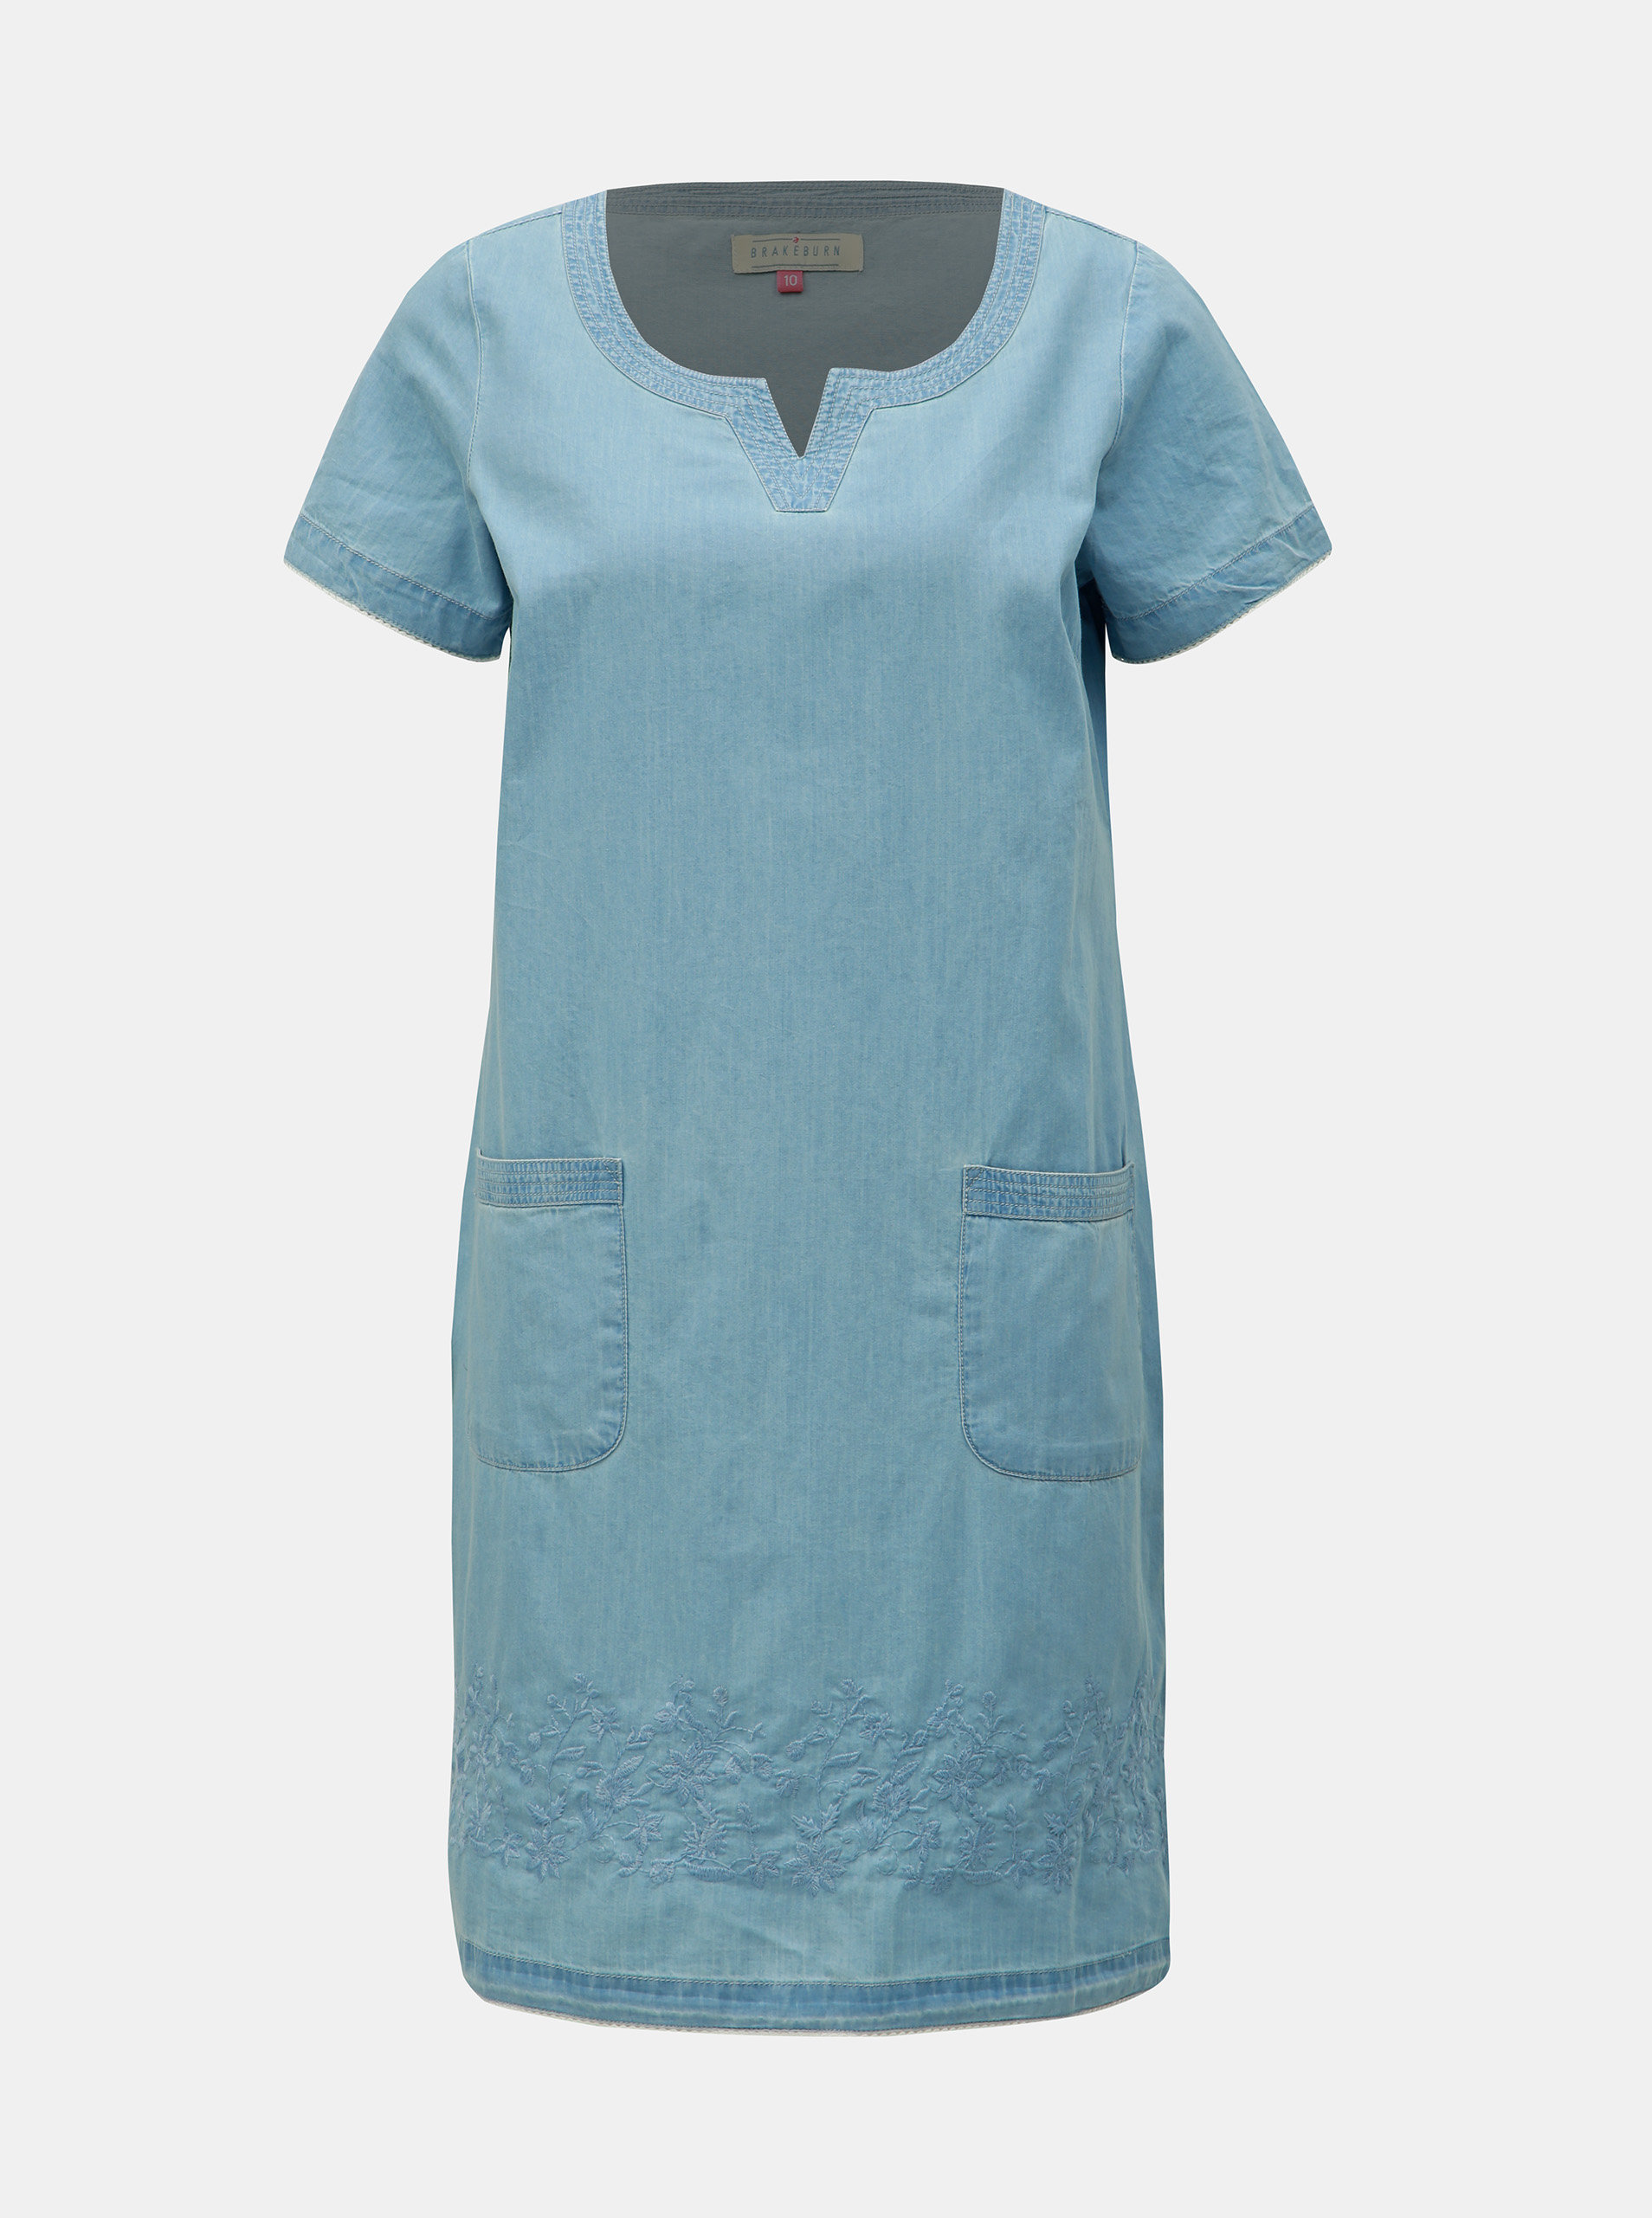 4cd8cf229d47 Svetlomodré šaty s výšivkou a ozdobnými lemami Brakeburn ...